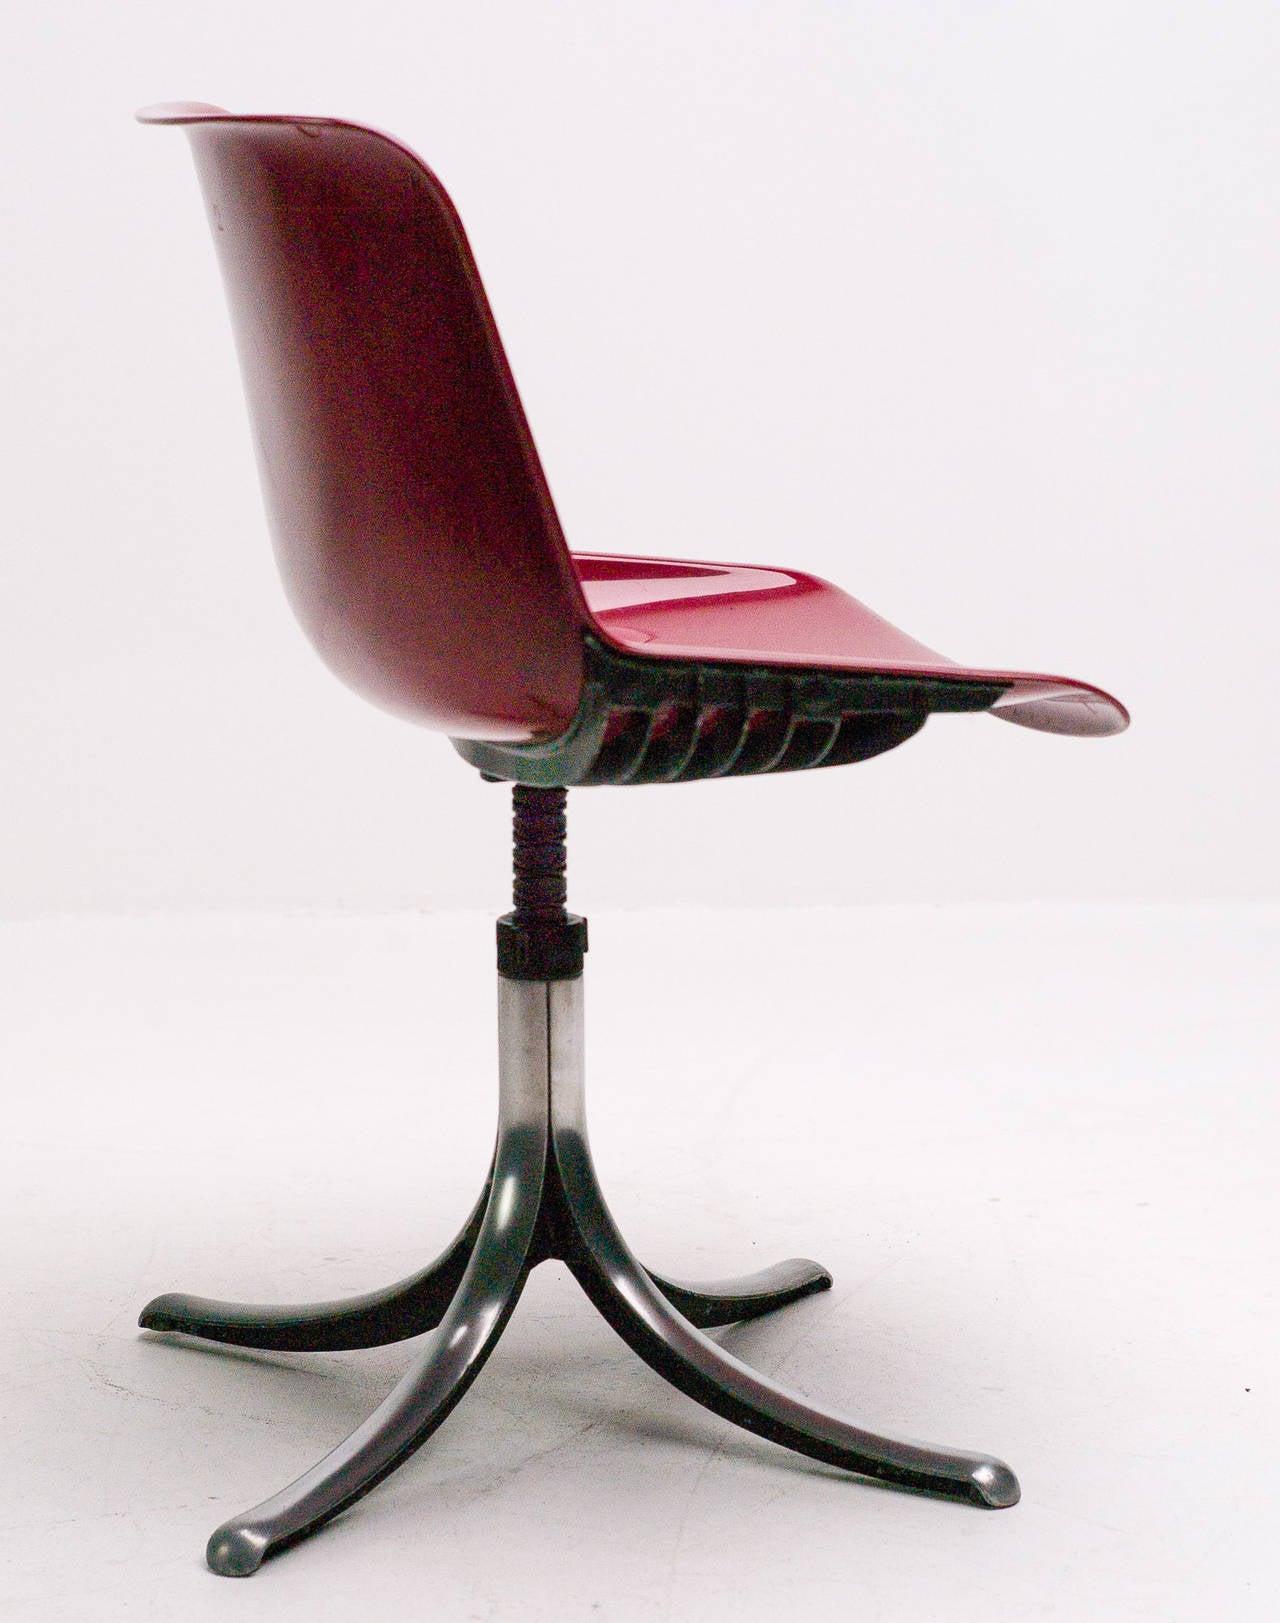 Set of Three Tecno Modus Chairs Designed by Osvaldo Borsani 4